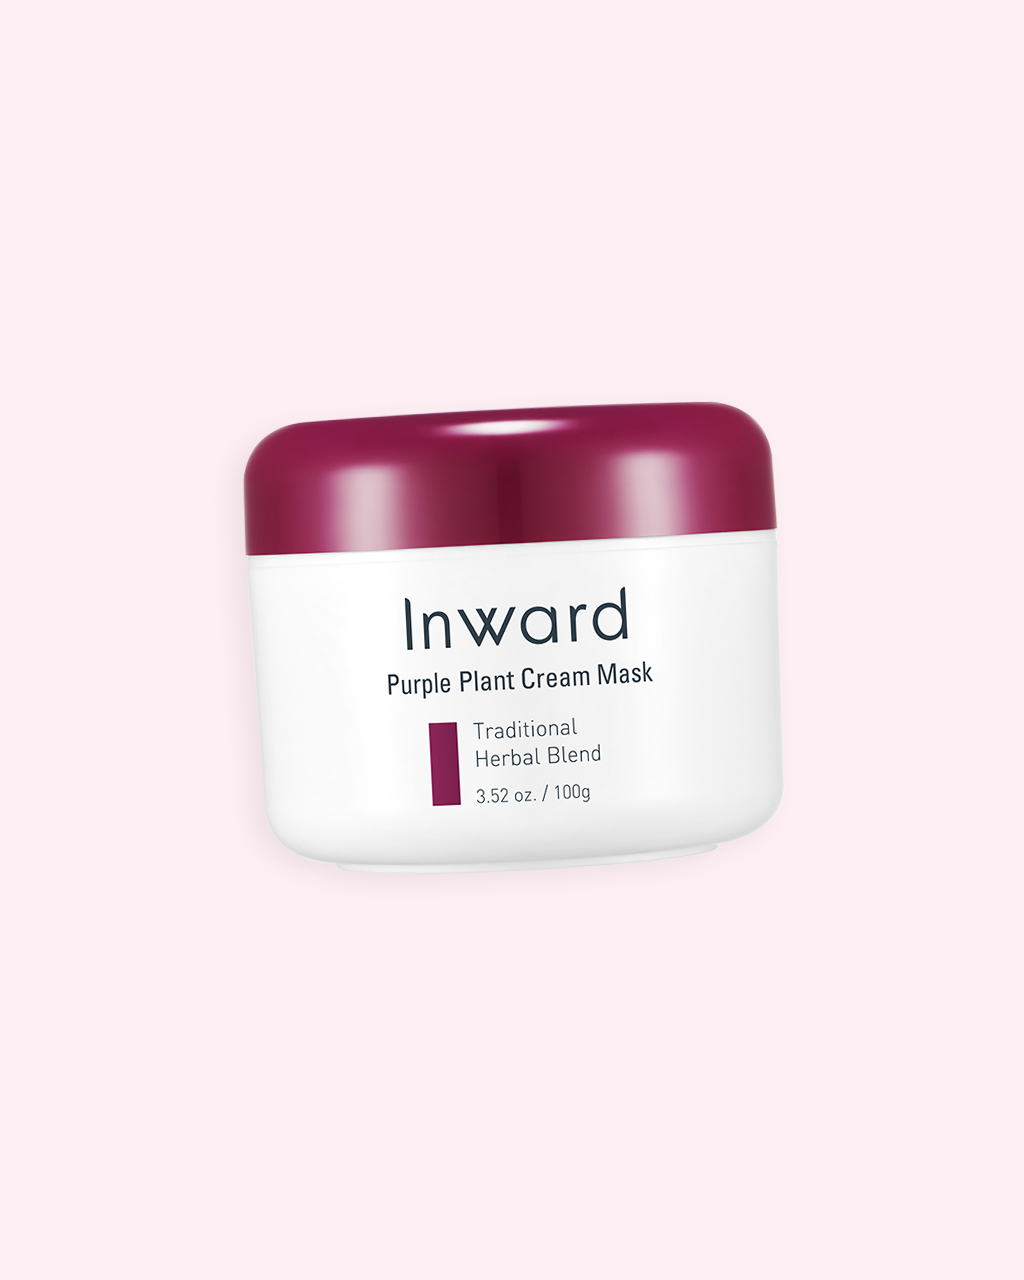 Inward Purple Plant Cream Mask